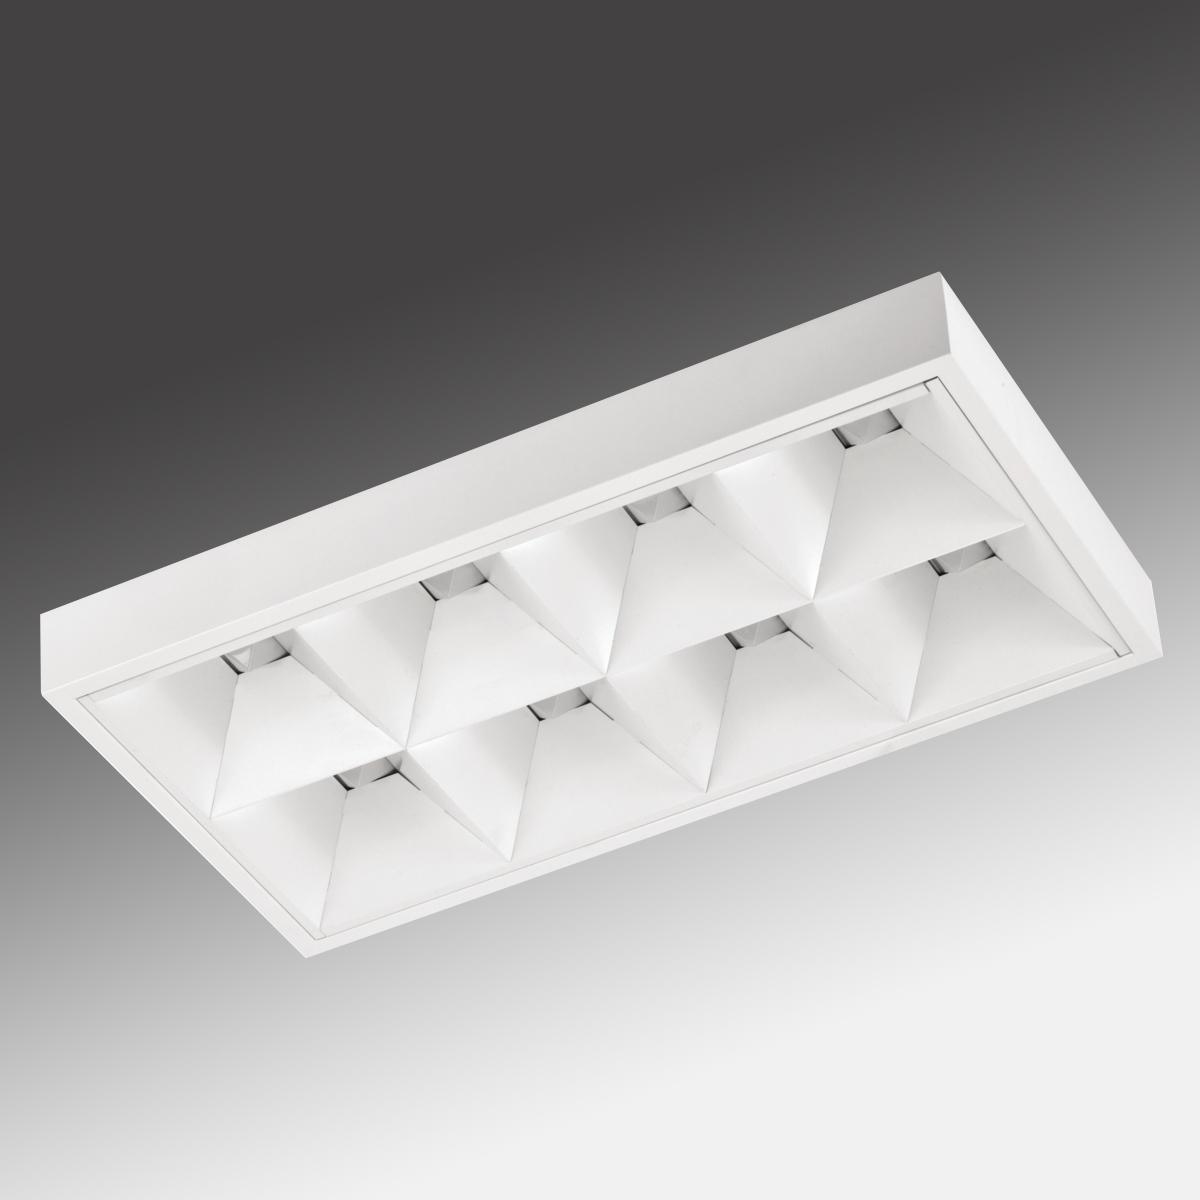 SALENA LED 39W 3900lm/830 SLB EVG IP20 weiß